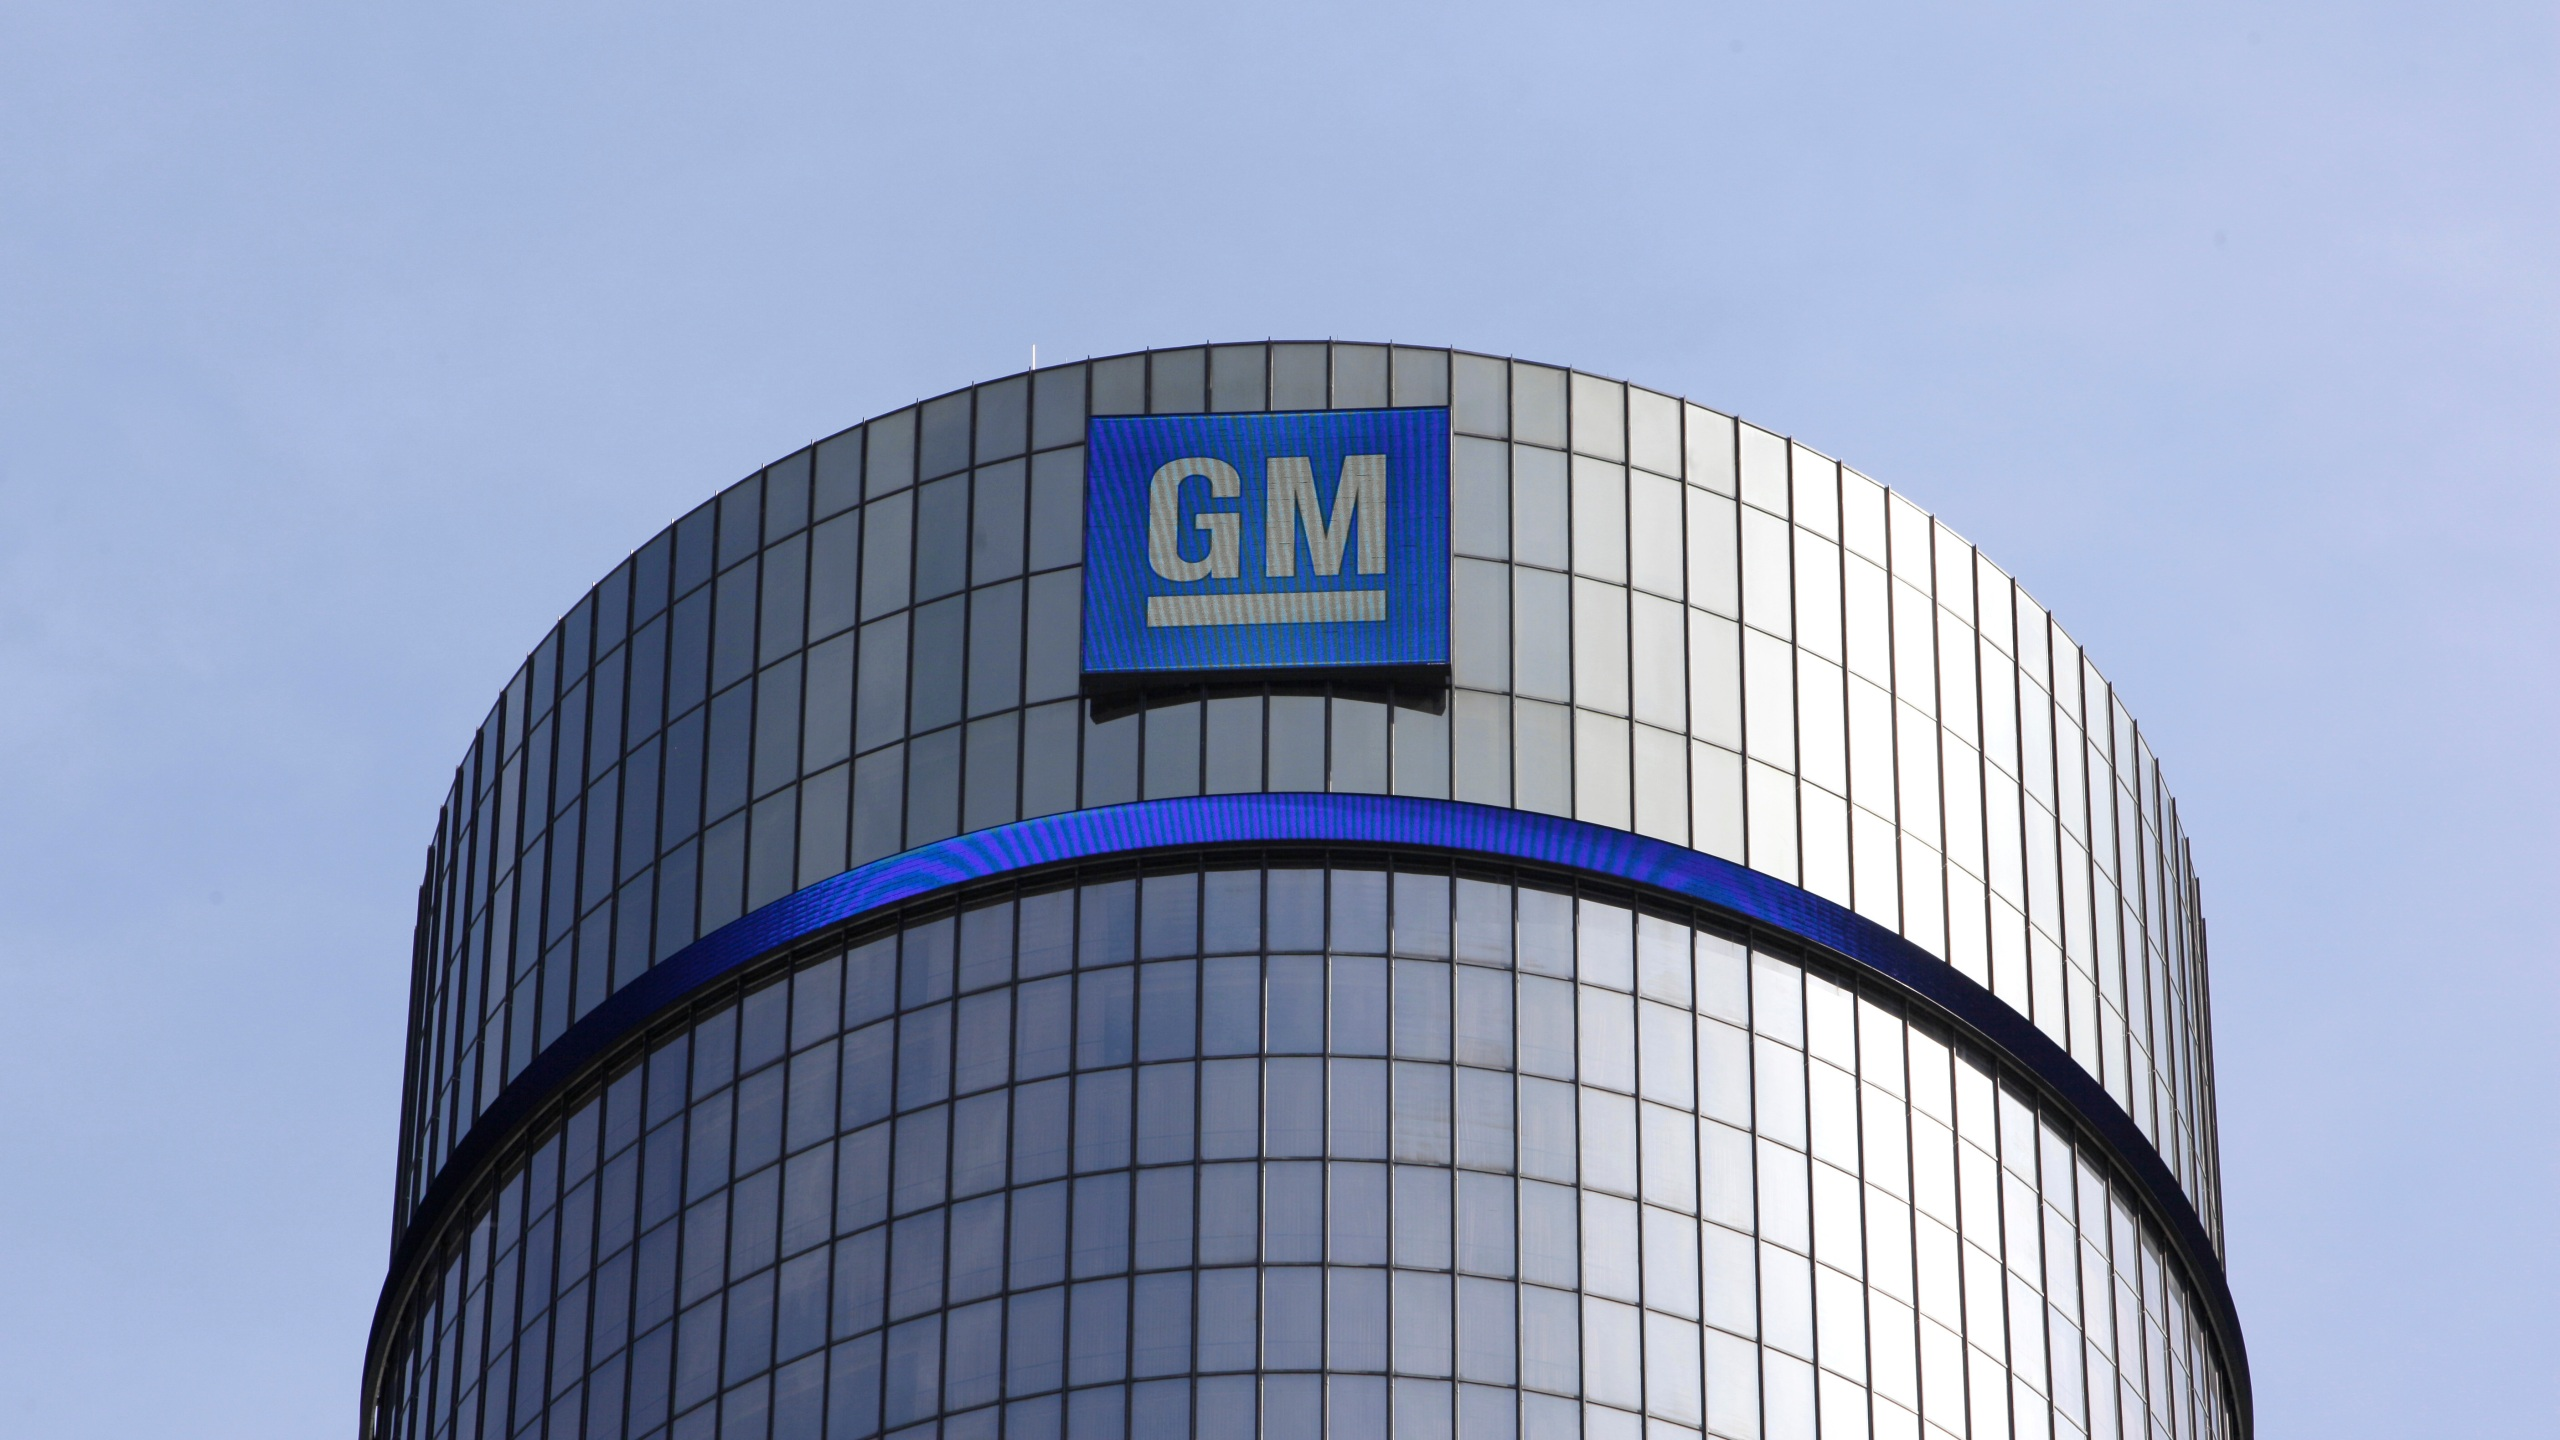 General_Motors_68808-159532.jpg83314224